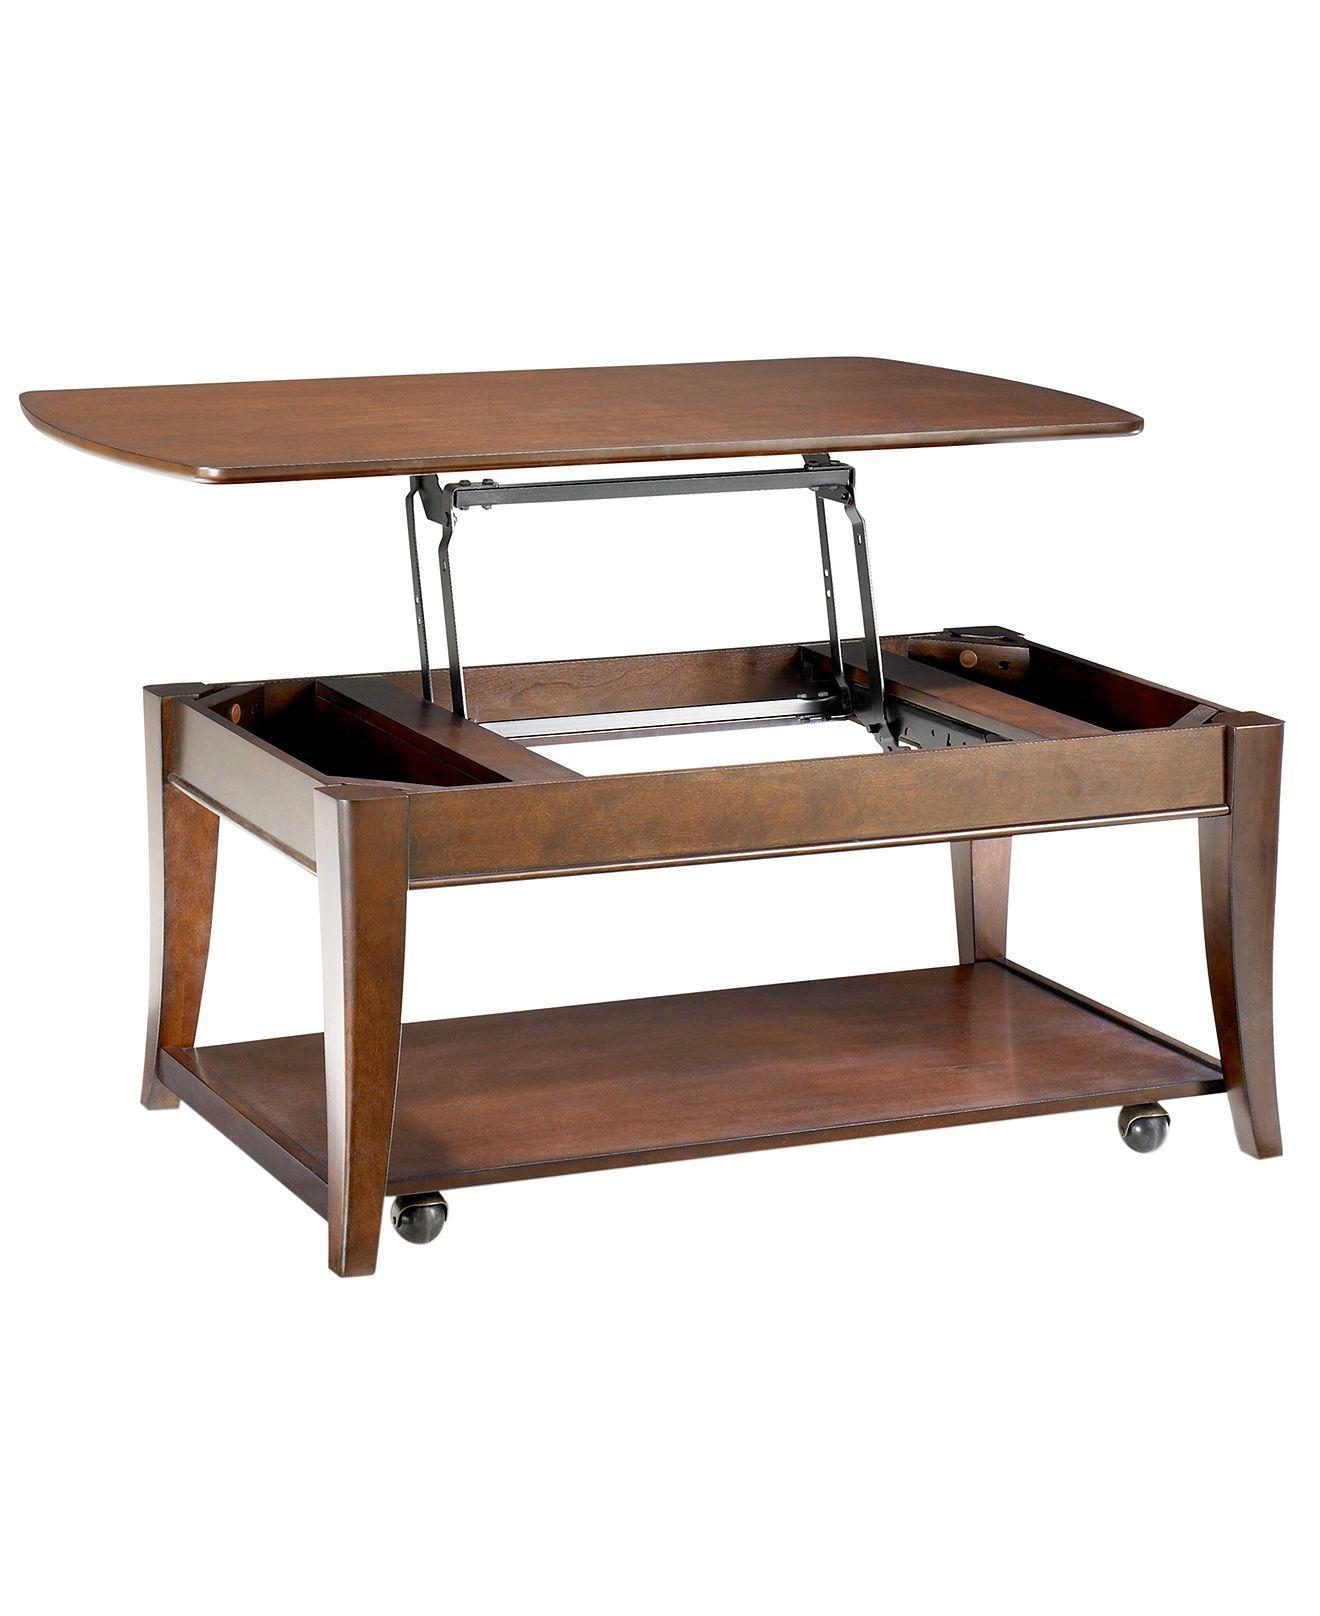 Quinn Cocktail Table Rectangular Lift Top Furniture Macy S Lift Top Coffee Table Coffee Table Top Furniture [ 1616 x 1320 Pixel ]